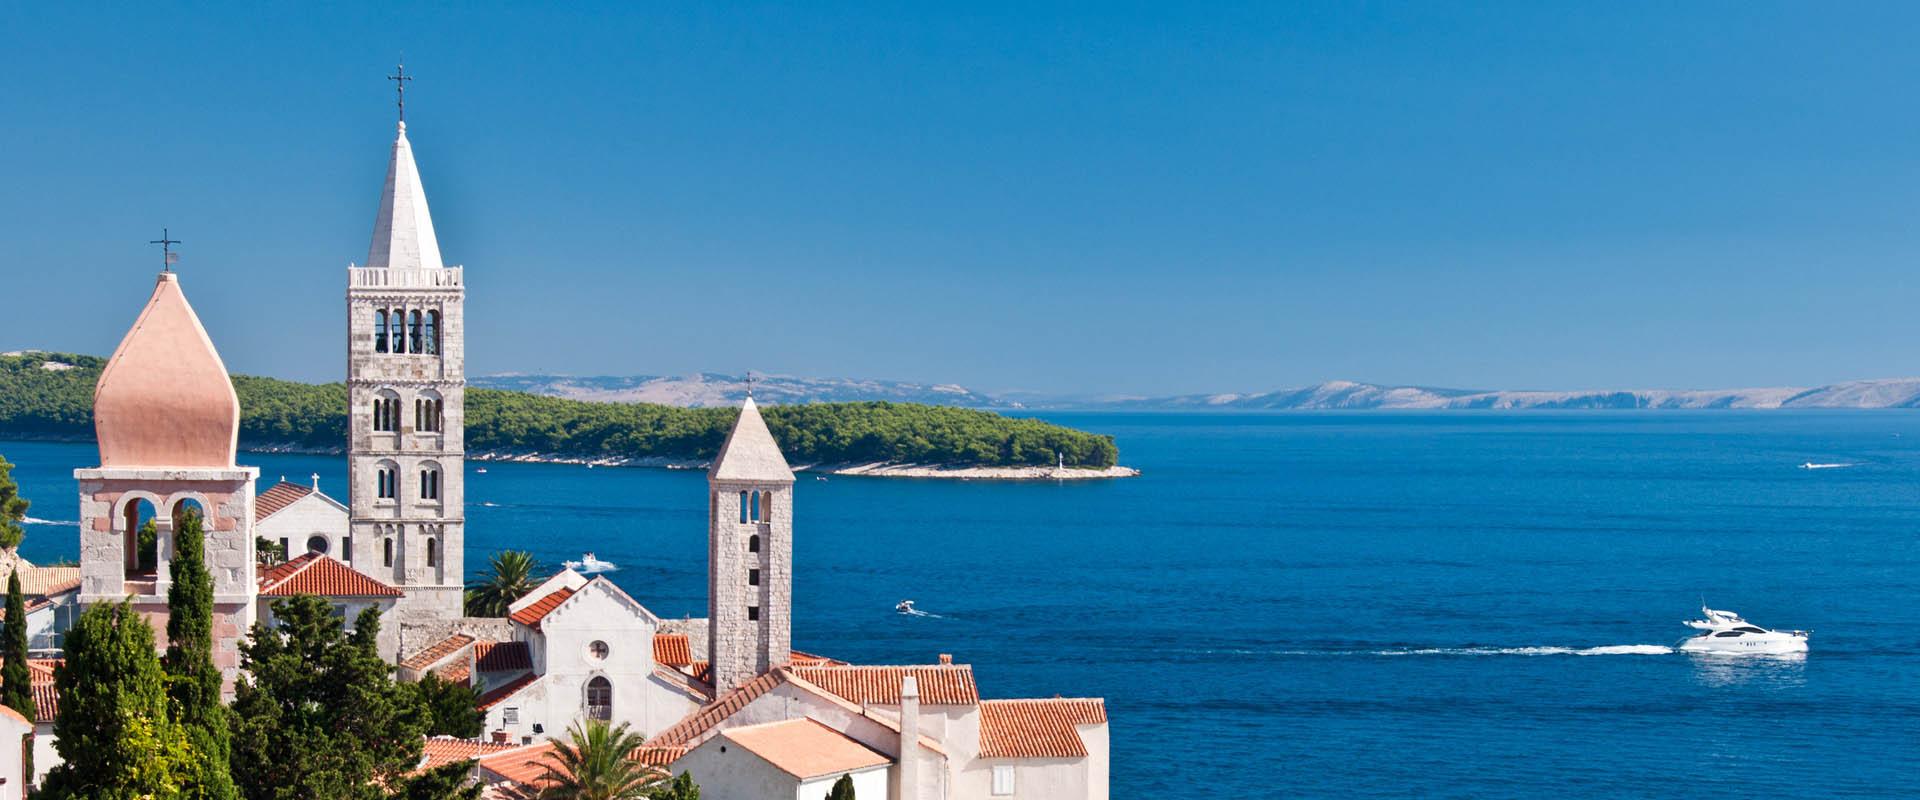 croatia public holidays 2019 publicholidayseu